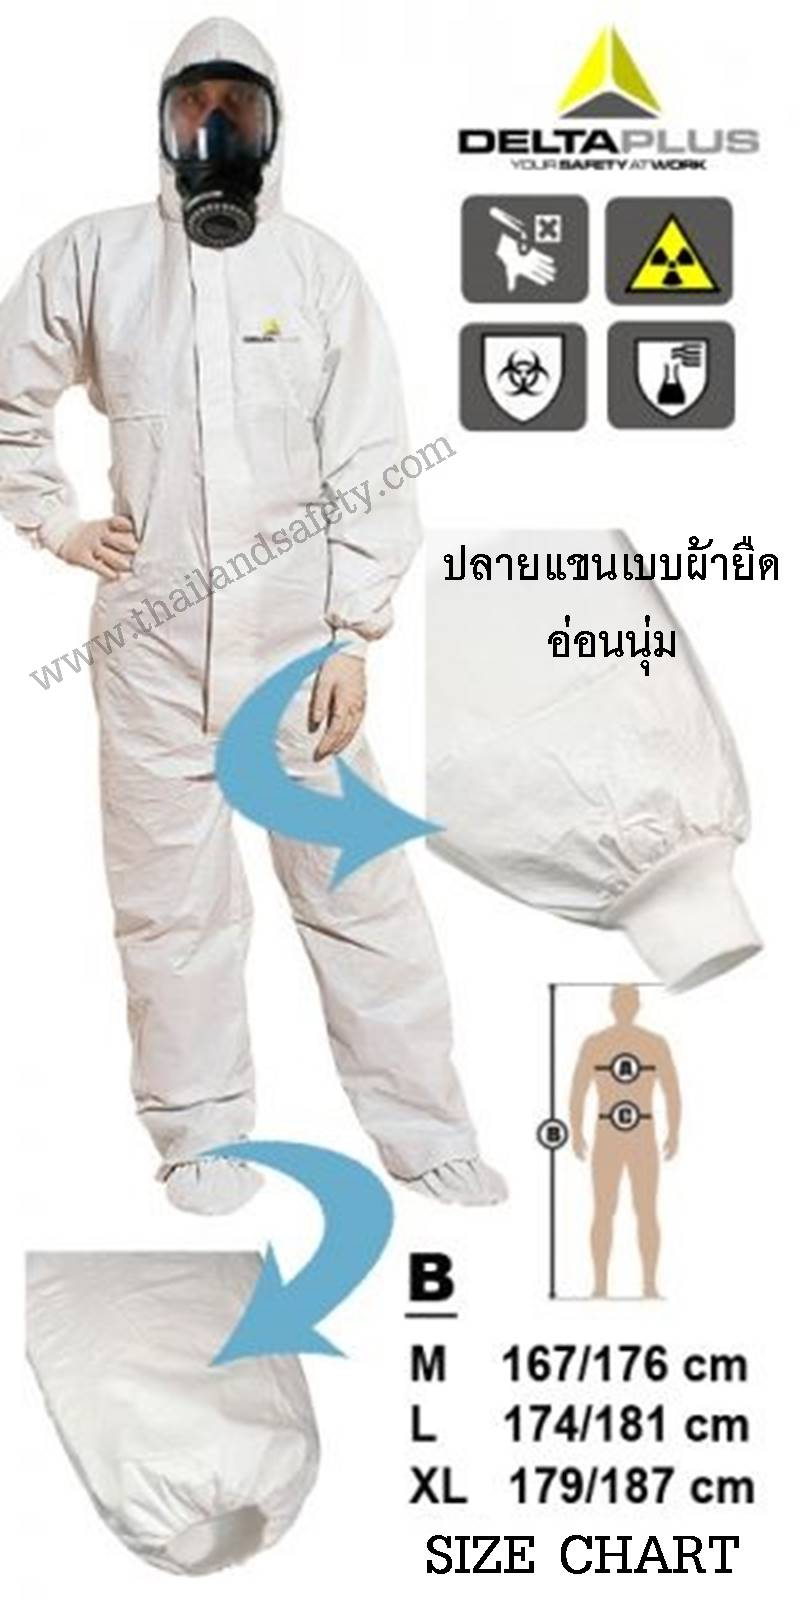 http://thailandsafety.com/wp-content/uploads/2016/06/DT117-deltaplus-coverall.jpg